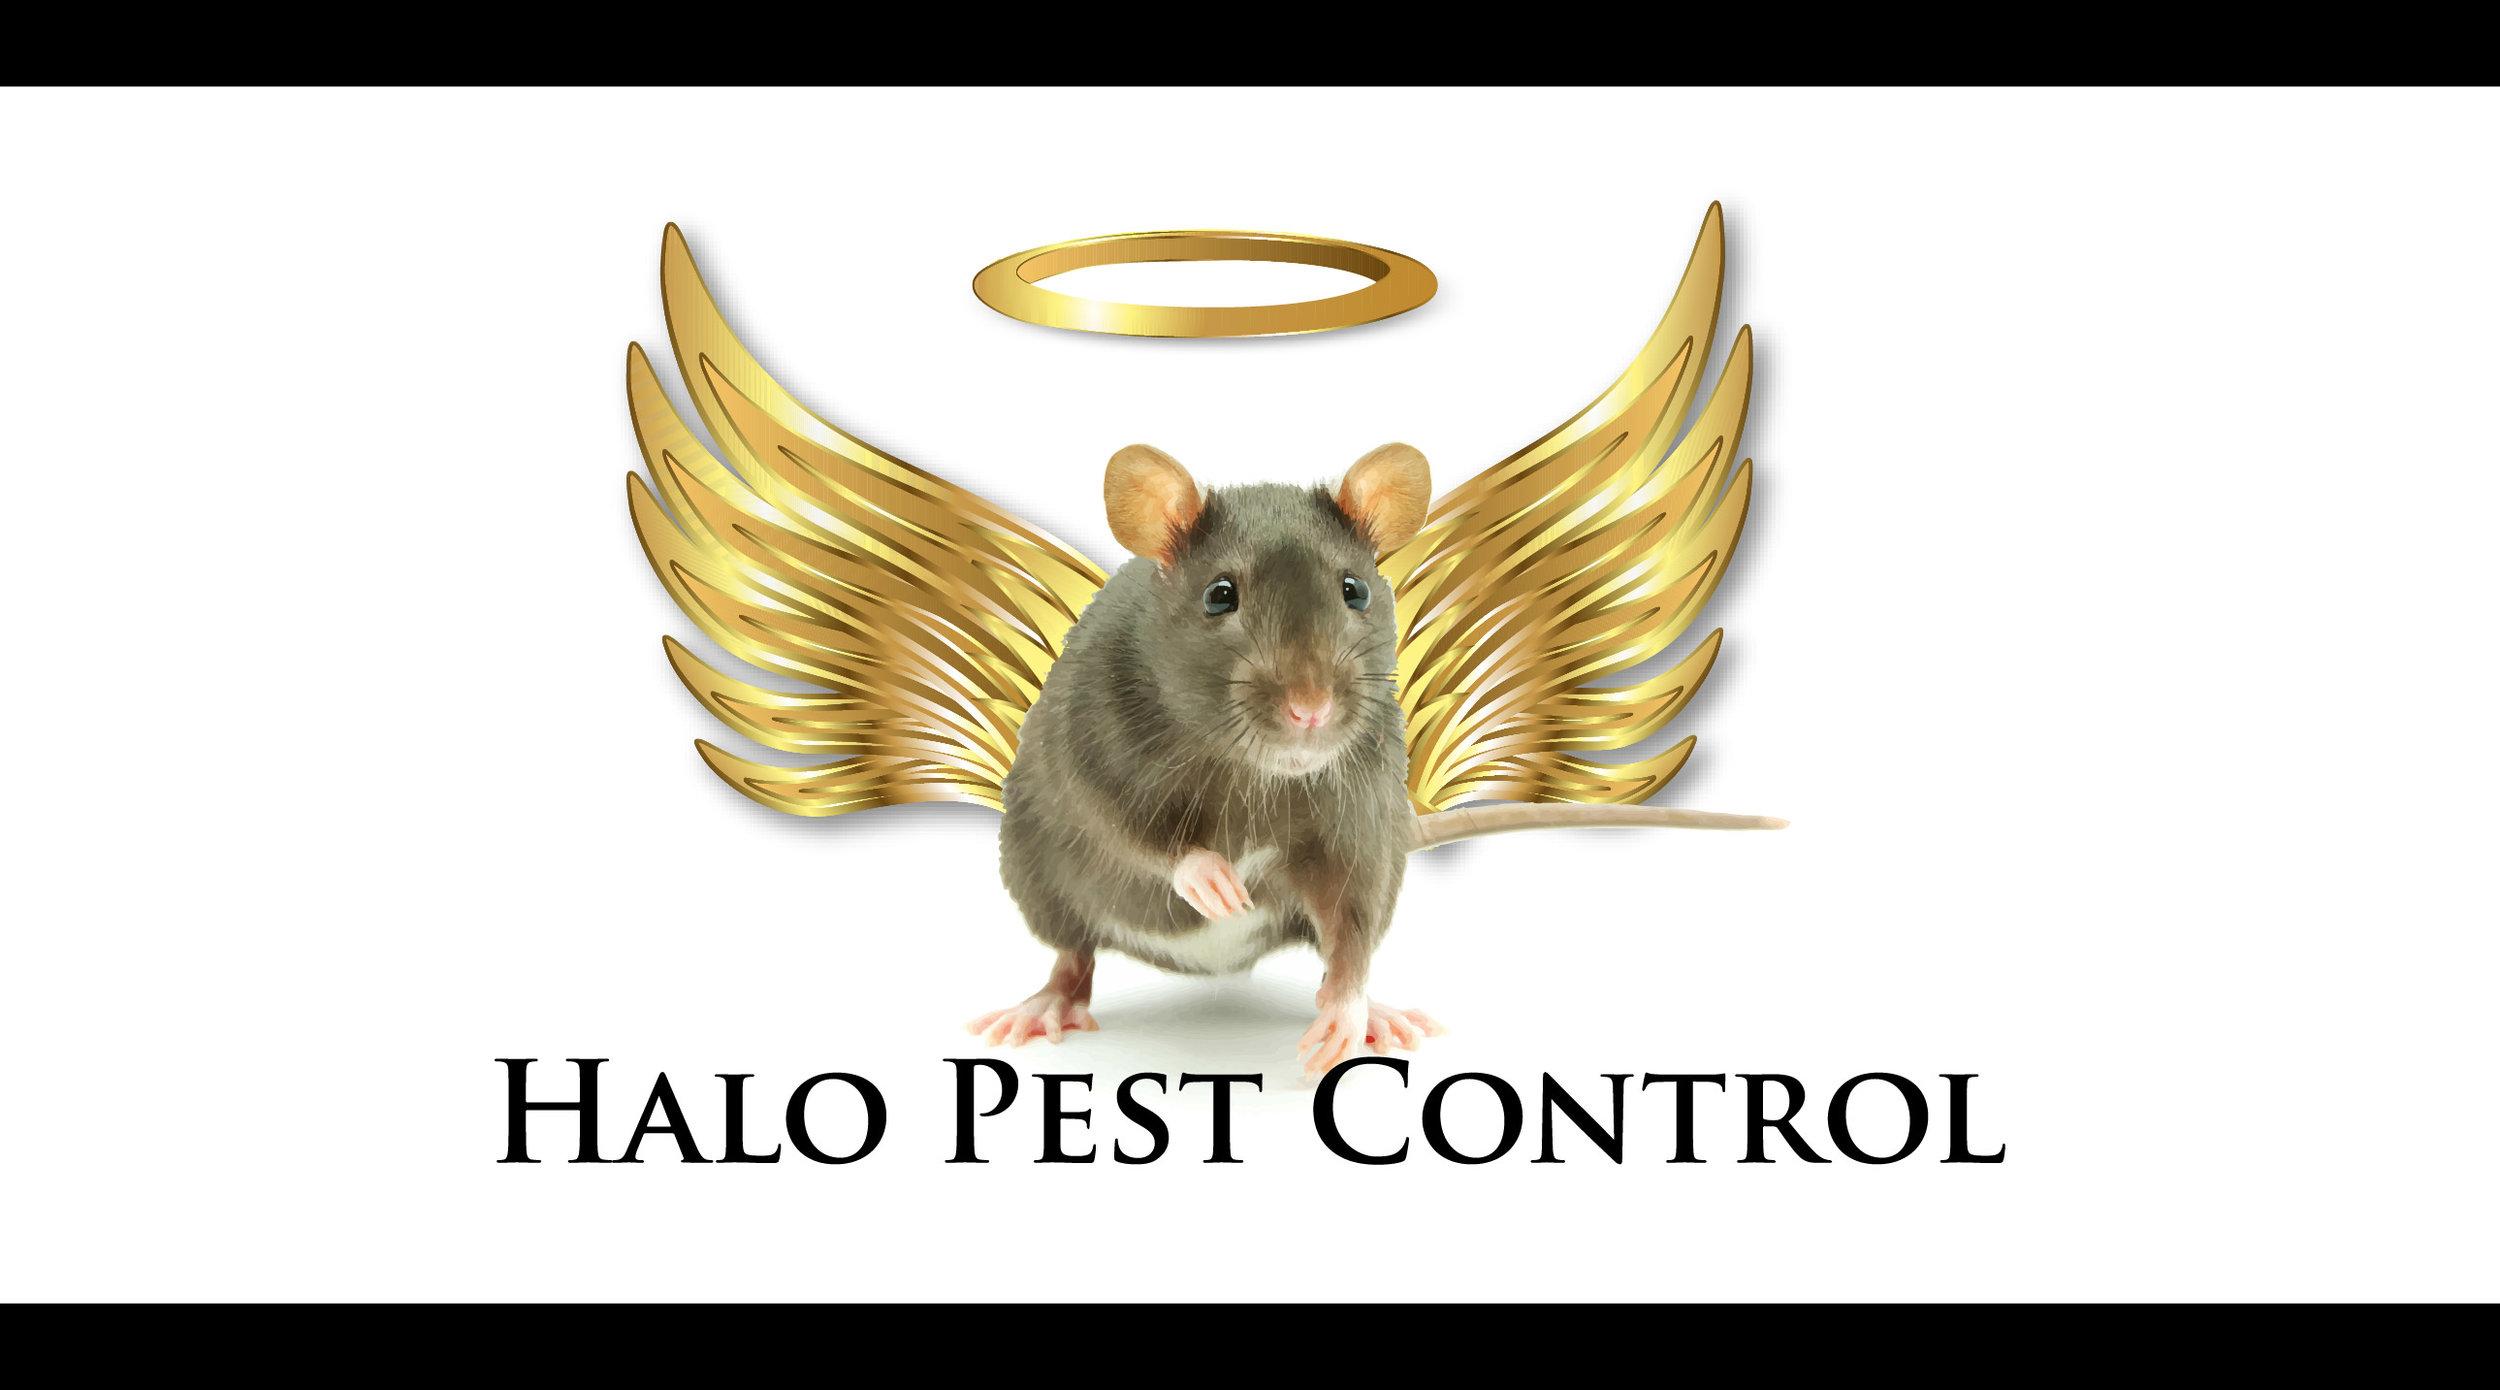 Halo Pest Control Logo Complete.jpg